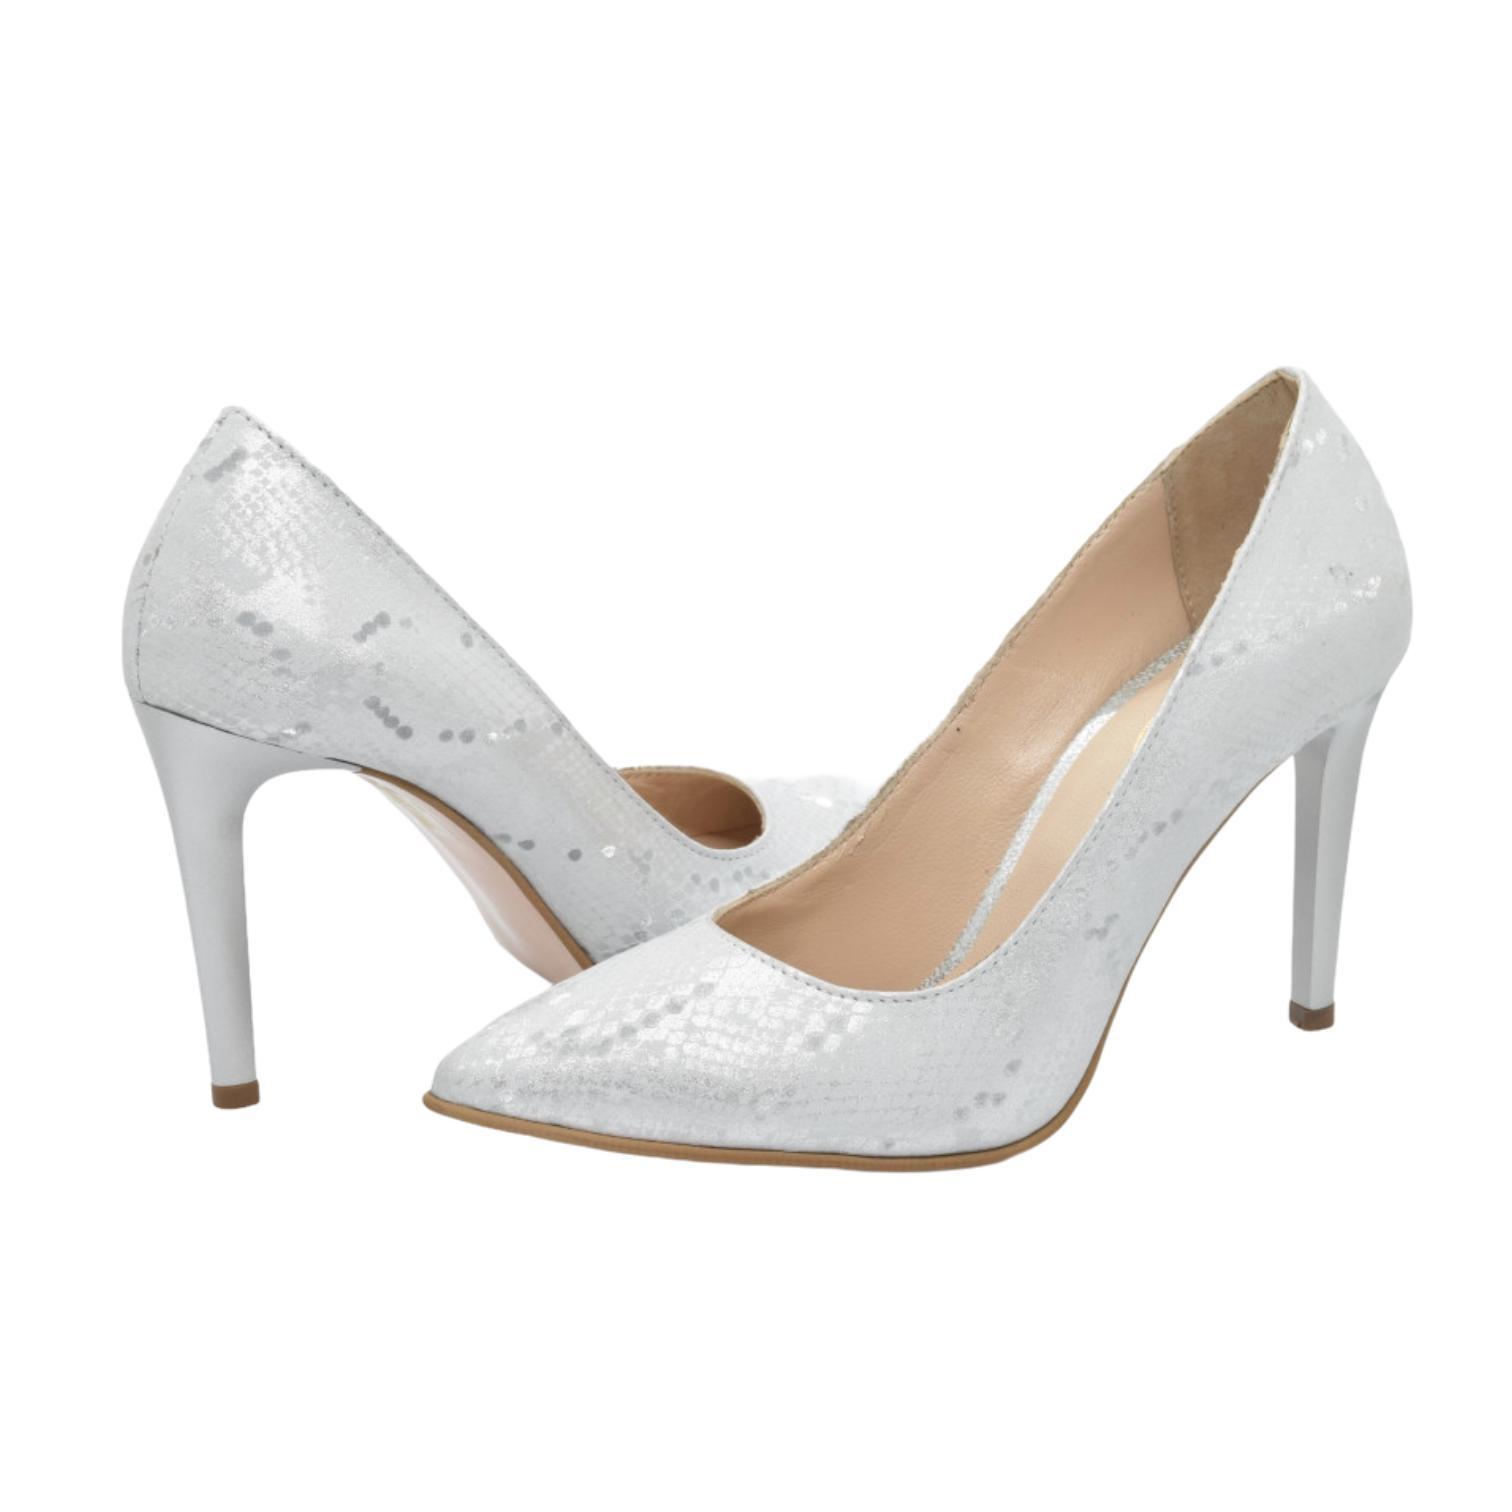 Pantofi cu imprimeu argintiu